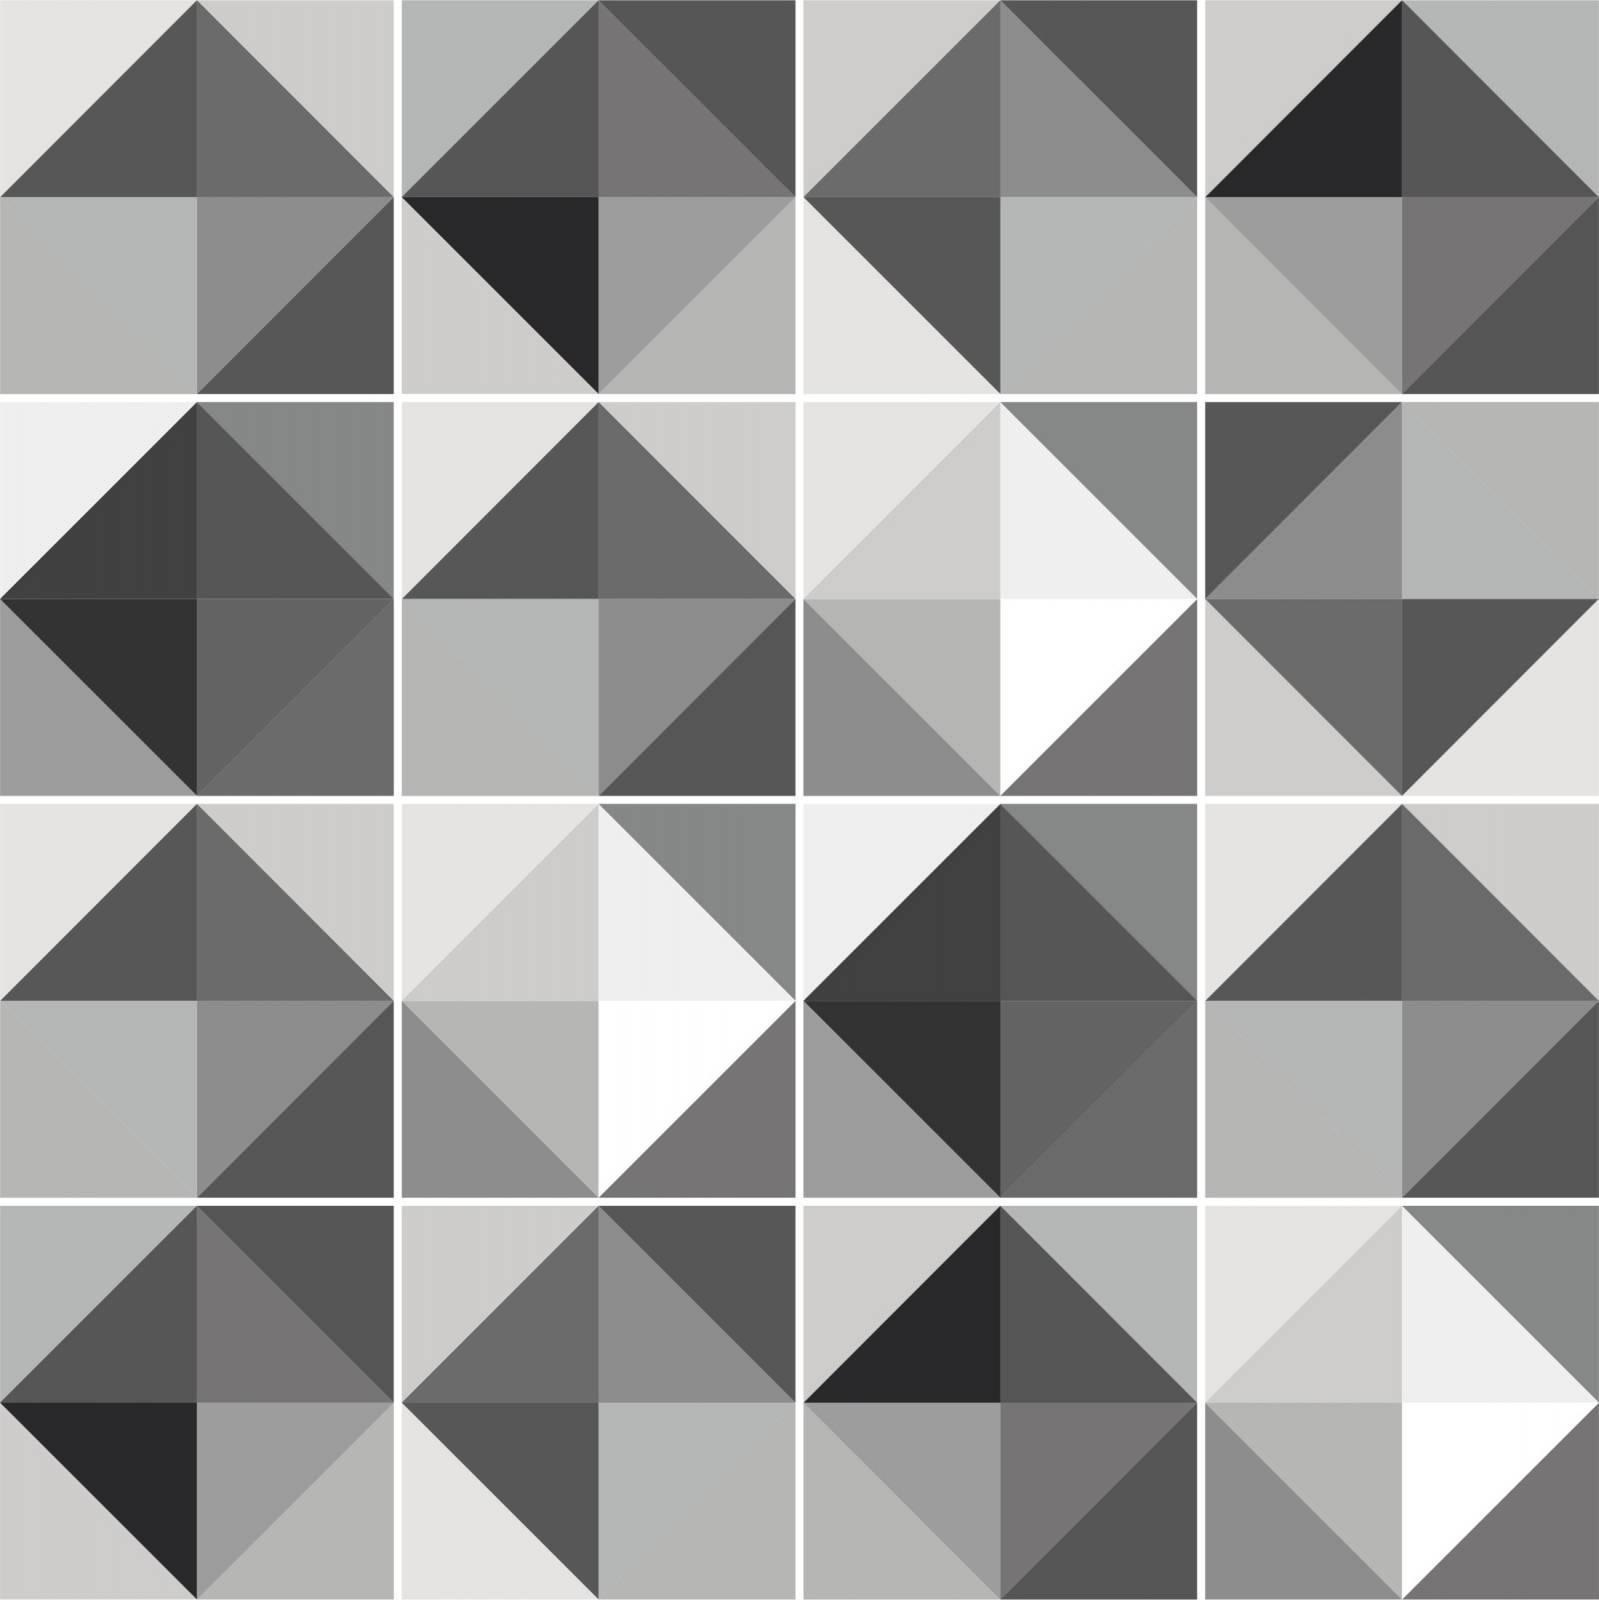 Adesivo para Azulejo - Cinza imagem 1